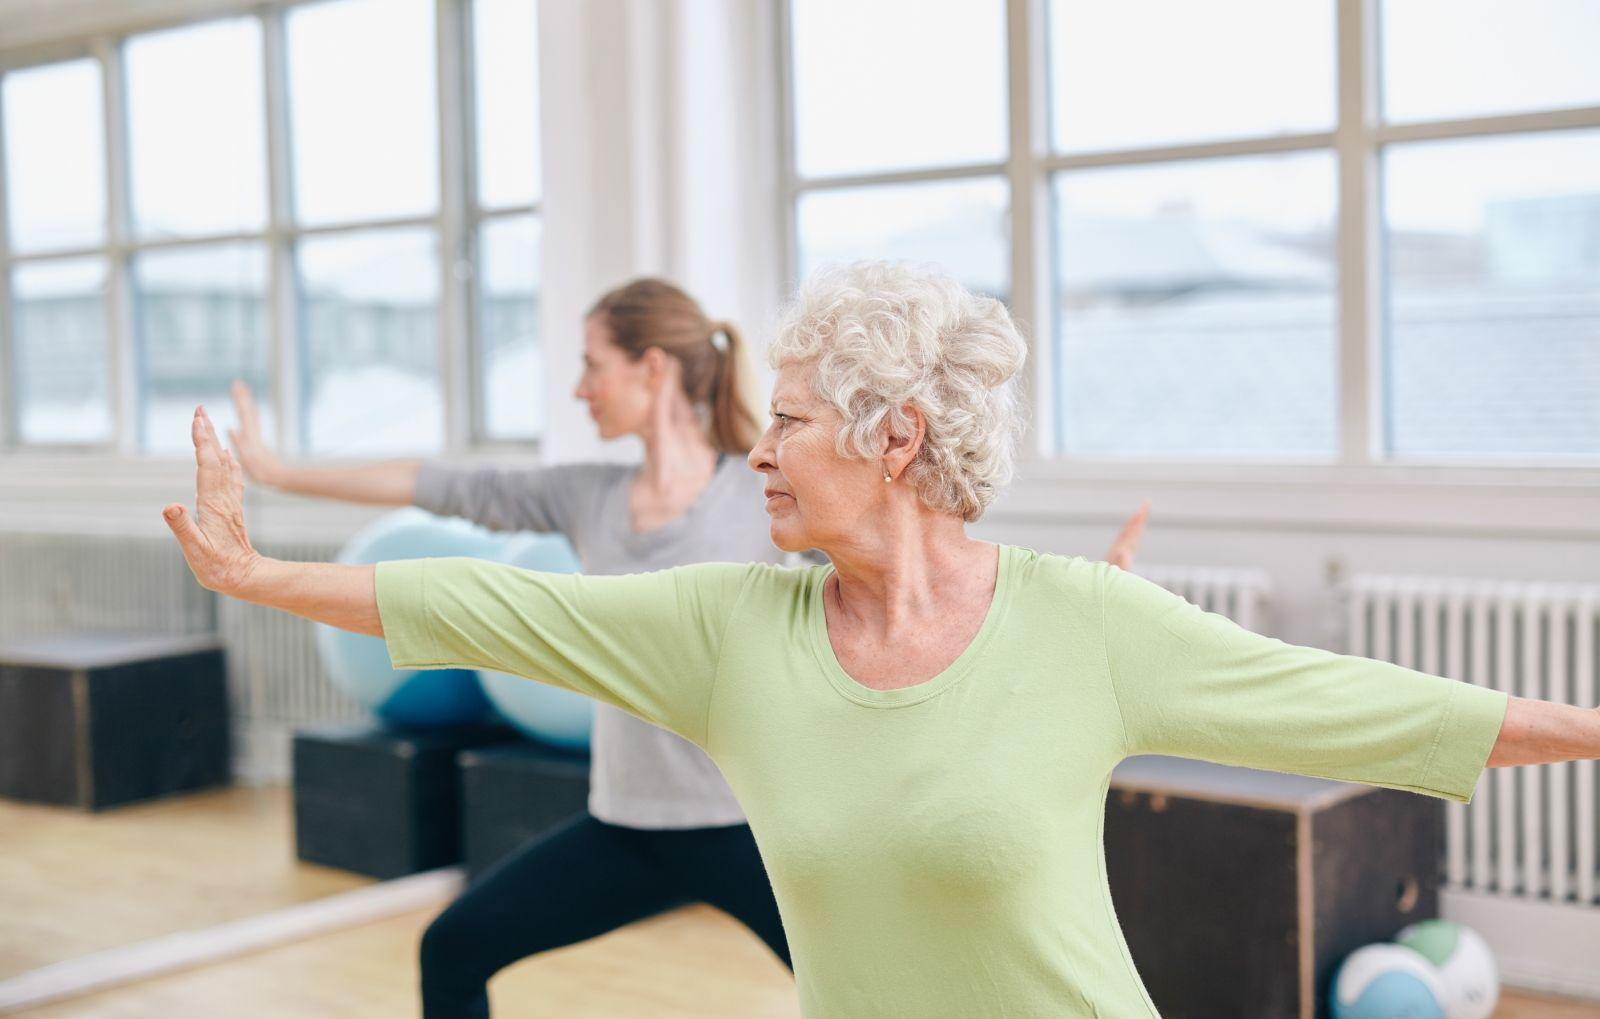 bigstock-Two-Women-Doing-Yoga-Workout-A-76765064